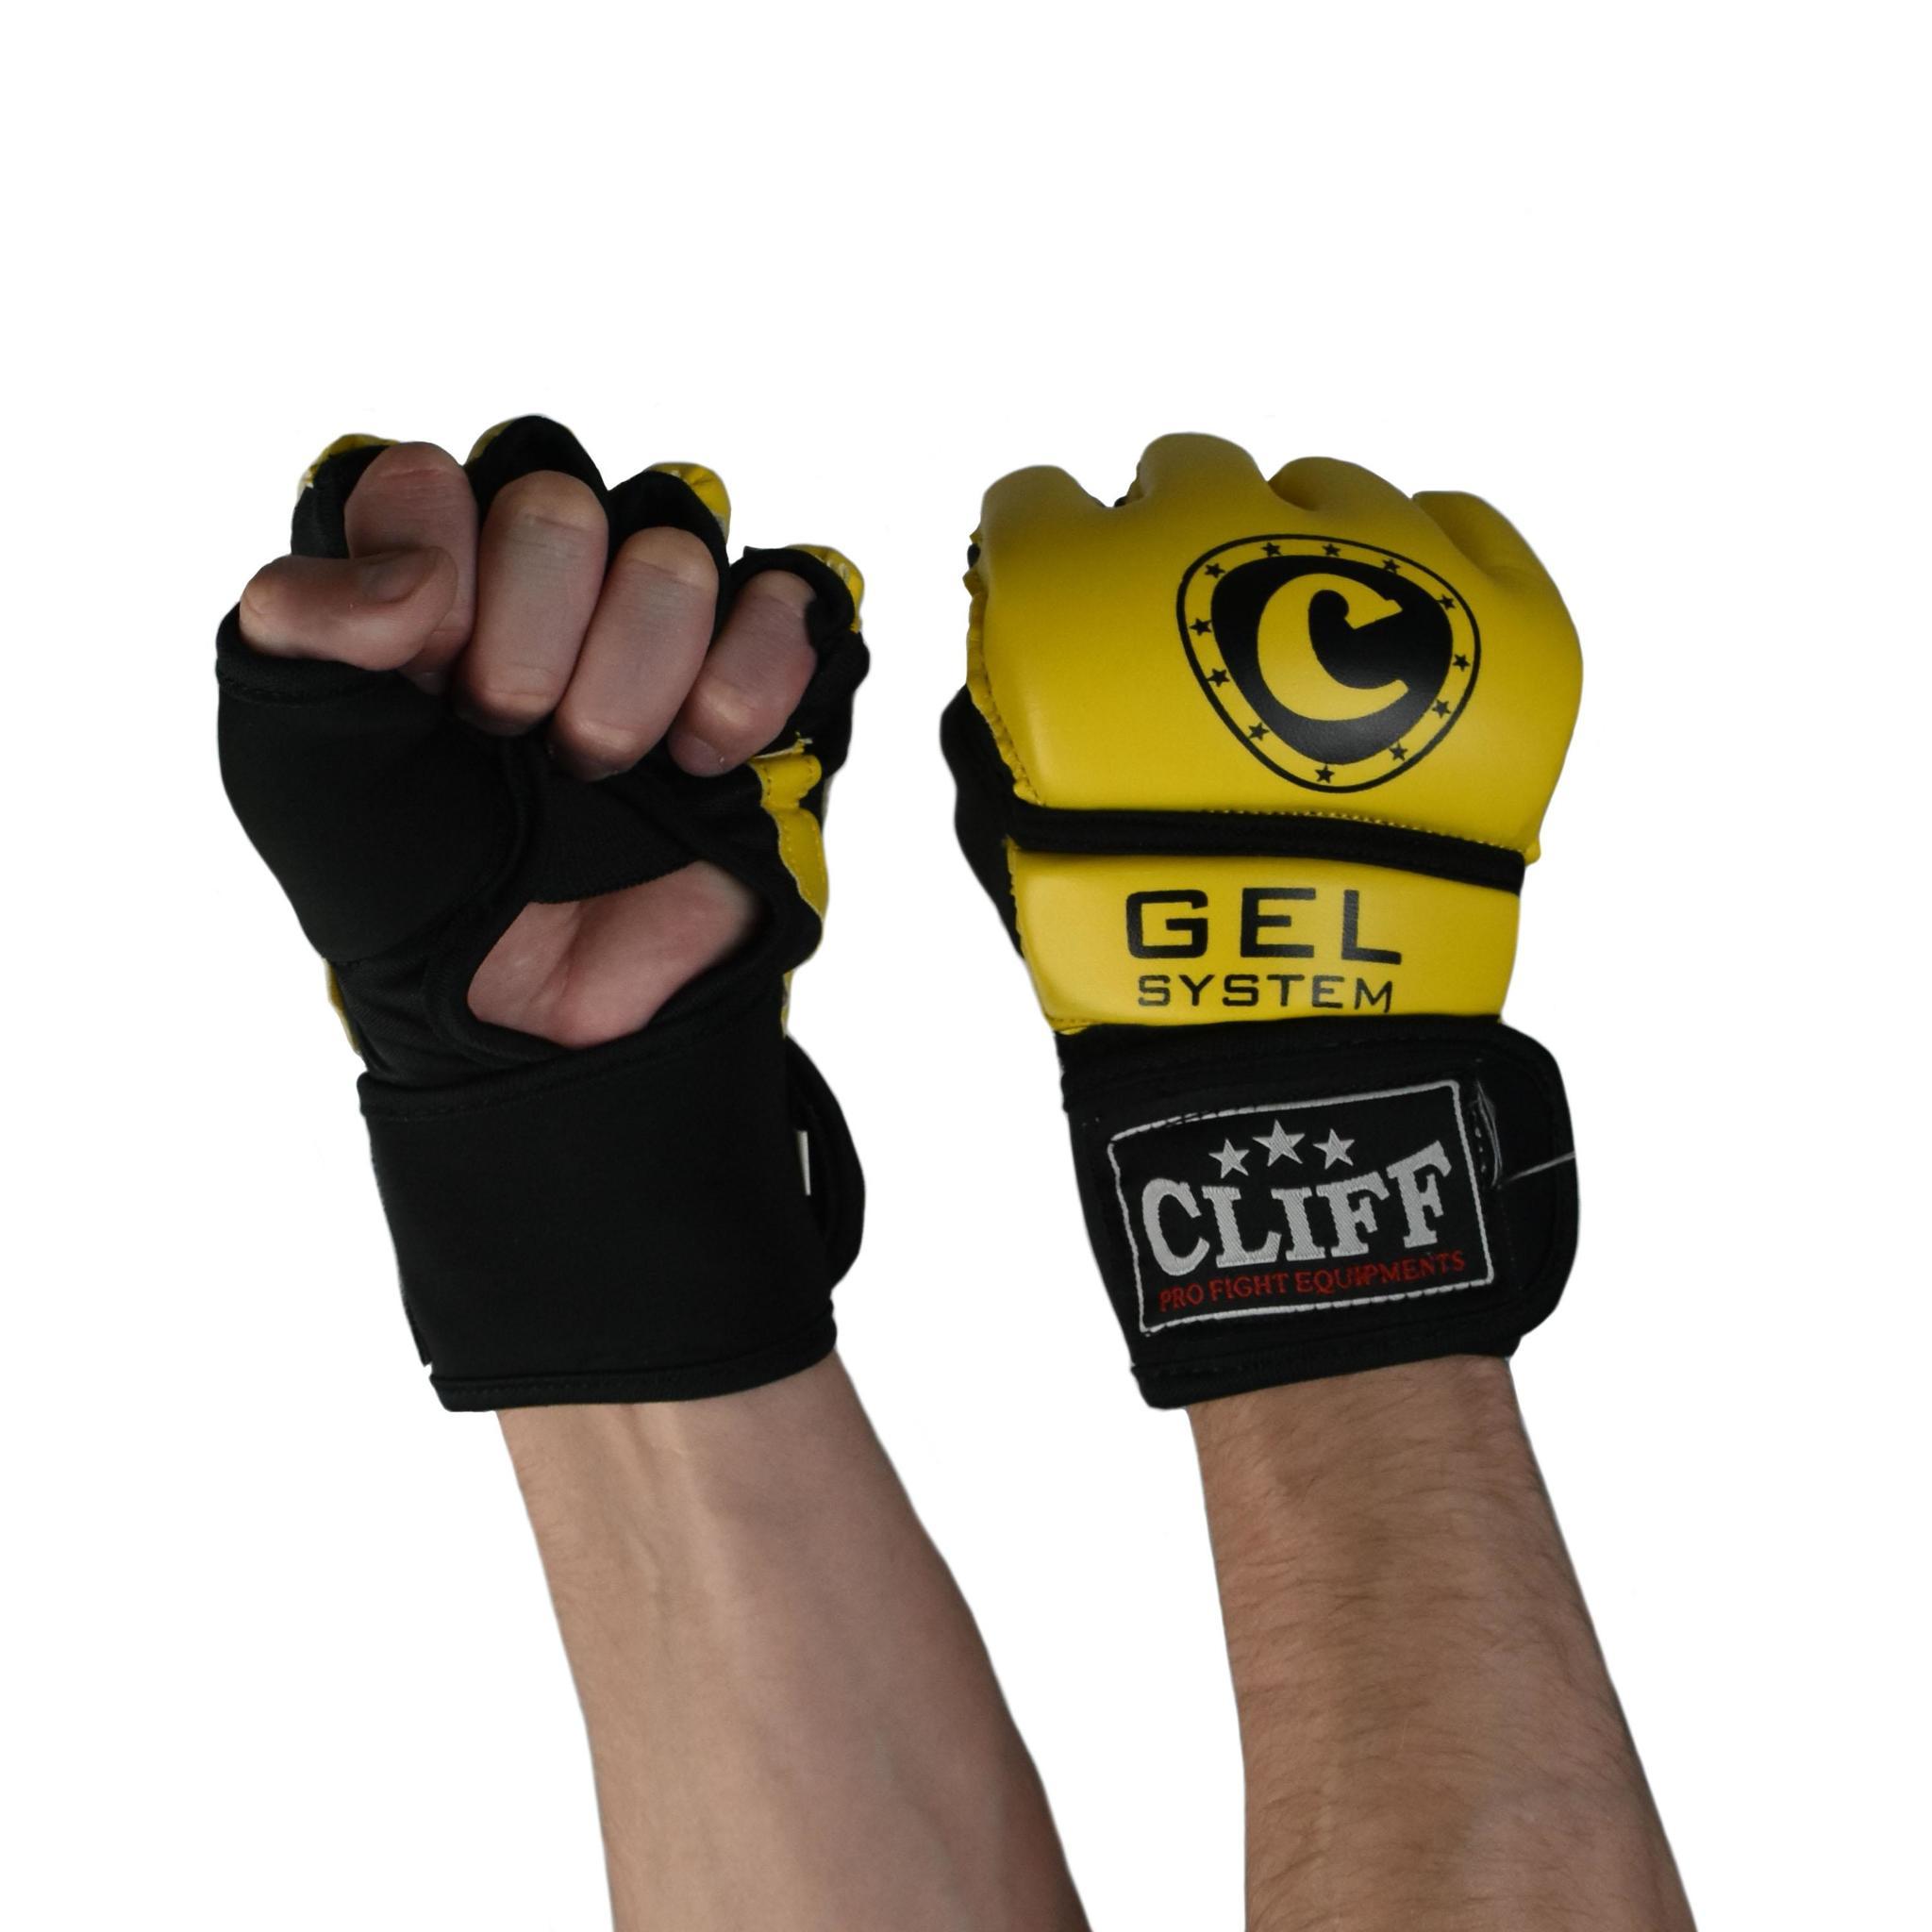 ММА перчатки Перчатки ММА Cliff желто-черные b61ca5a0f678b967f38336cf8d7e9033.jpg